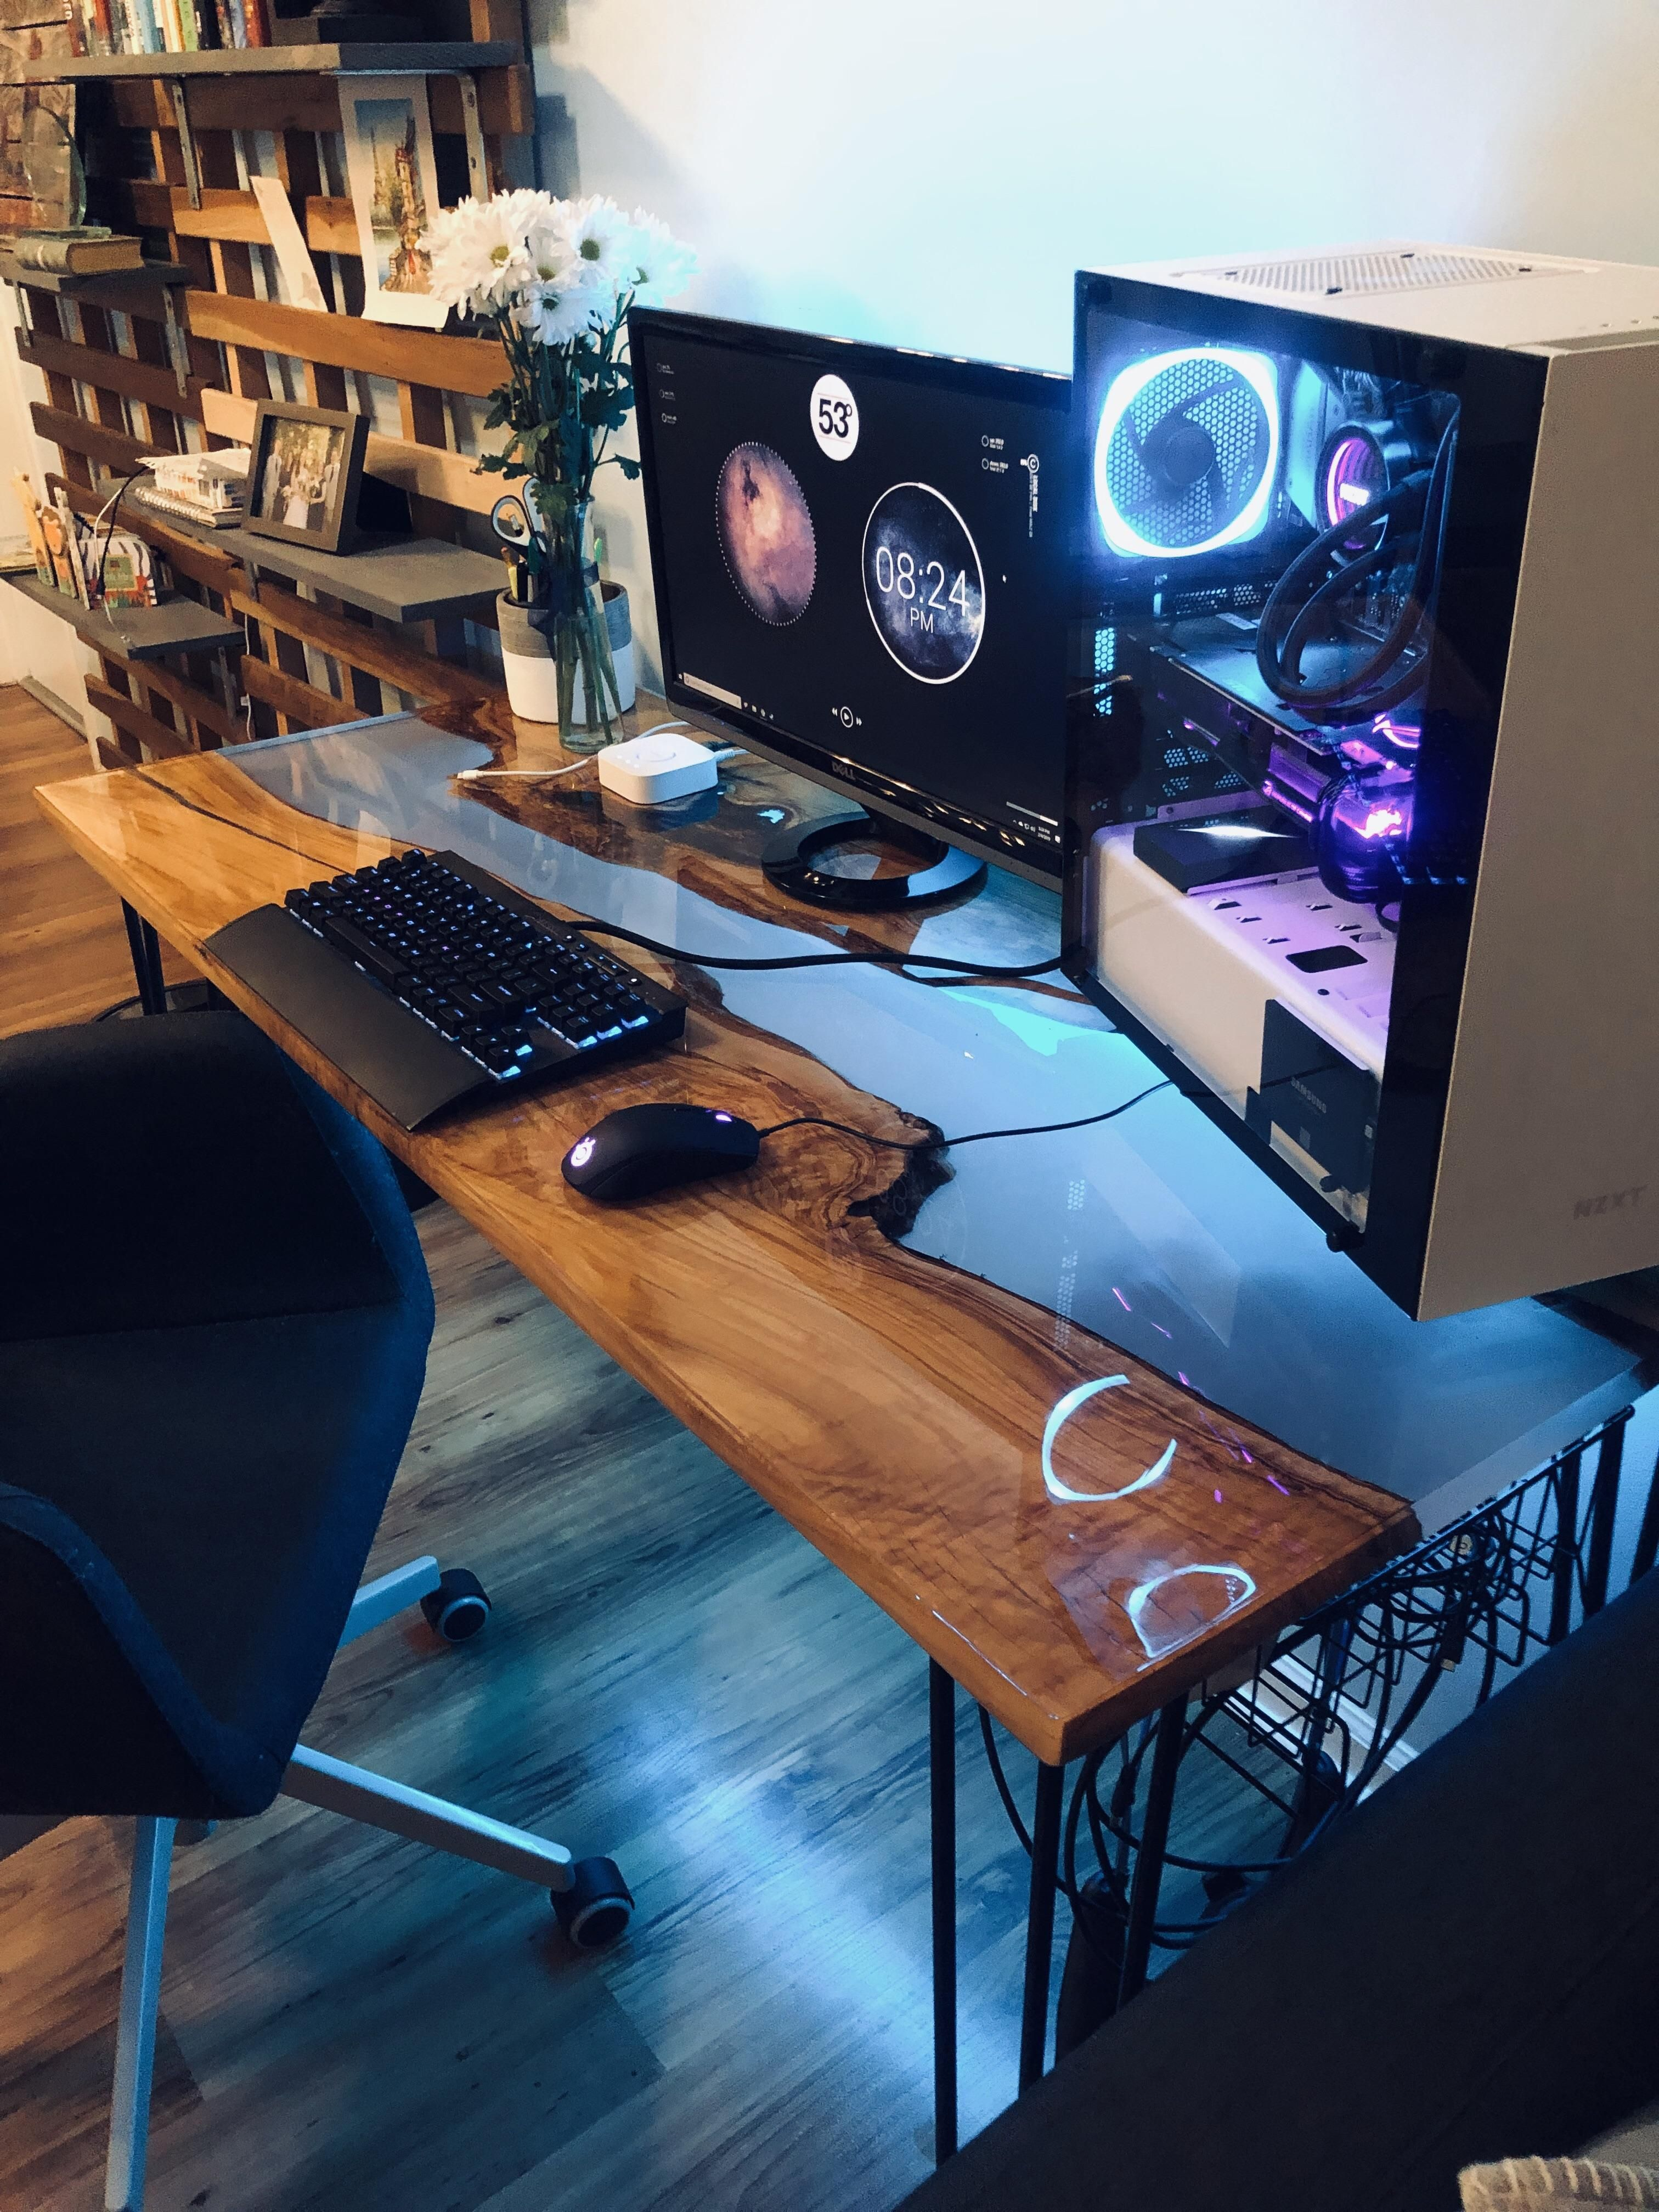 My New River Table Desk Build Diy Computer Desk Table Desk